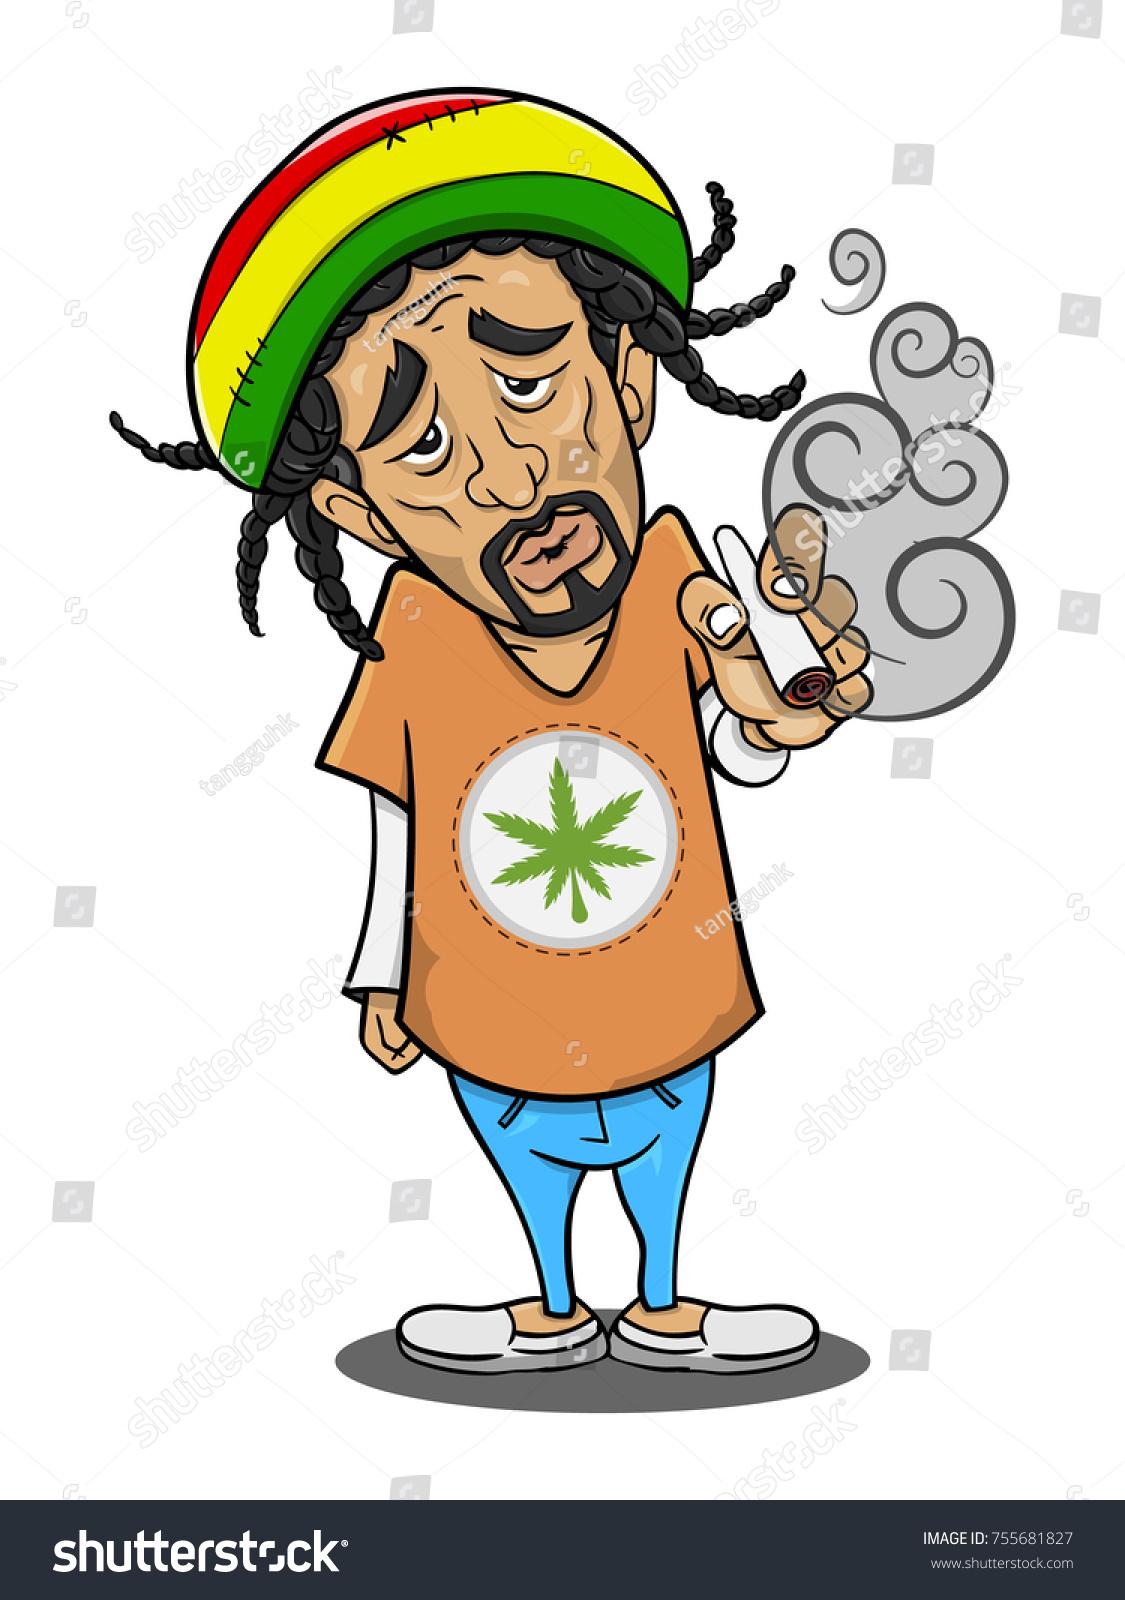 Man Smoking Cannabis Cartoon Vector Stock Vector Royalty Free